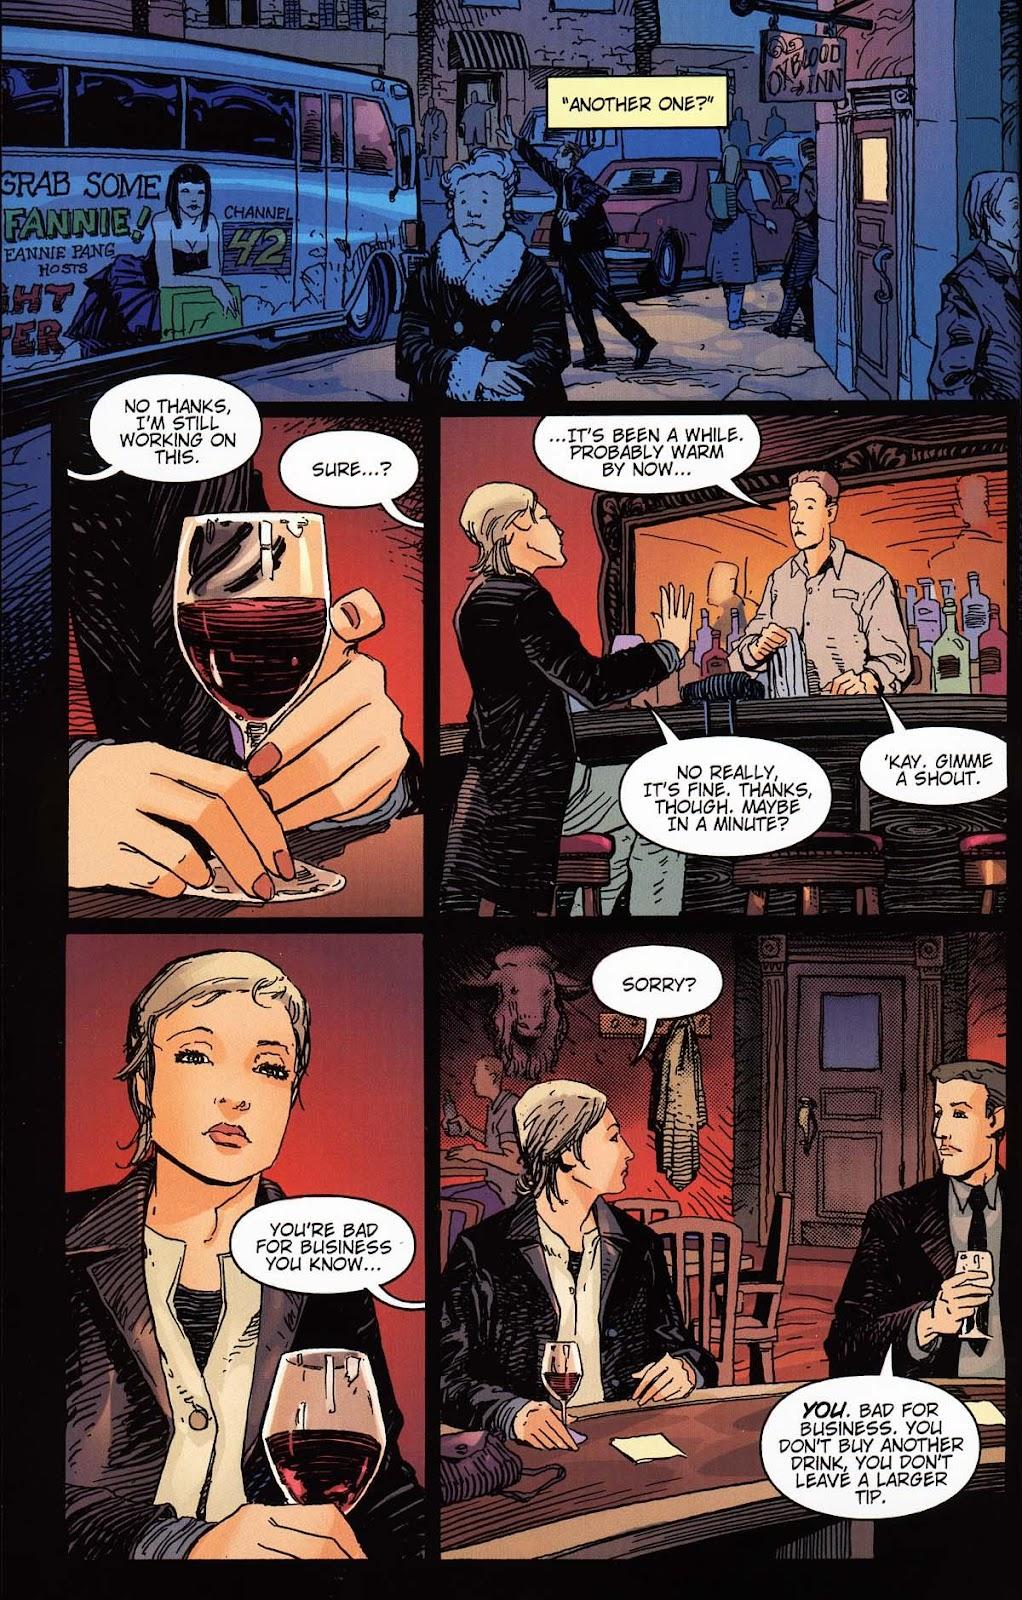 Read online Vampire the Masquerade comic -  Issue # Toreador - 16